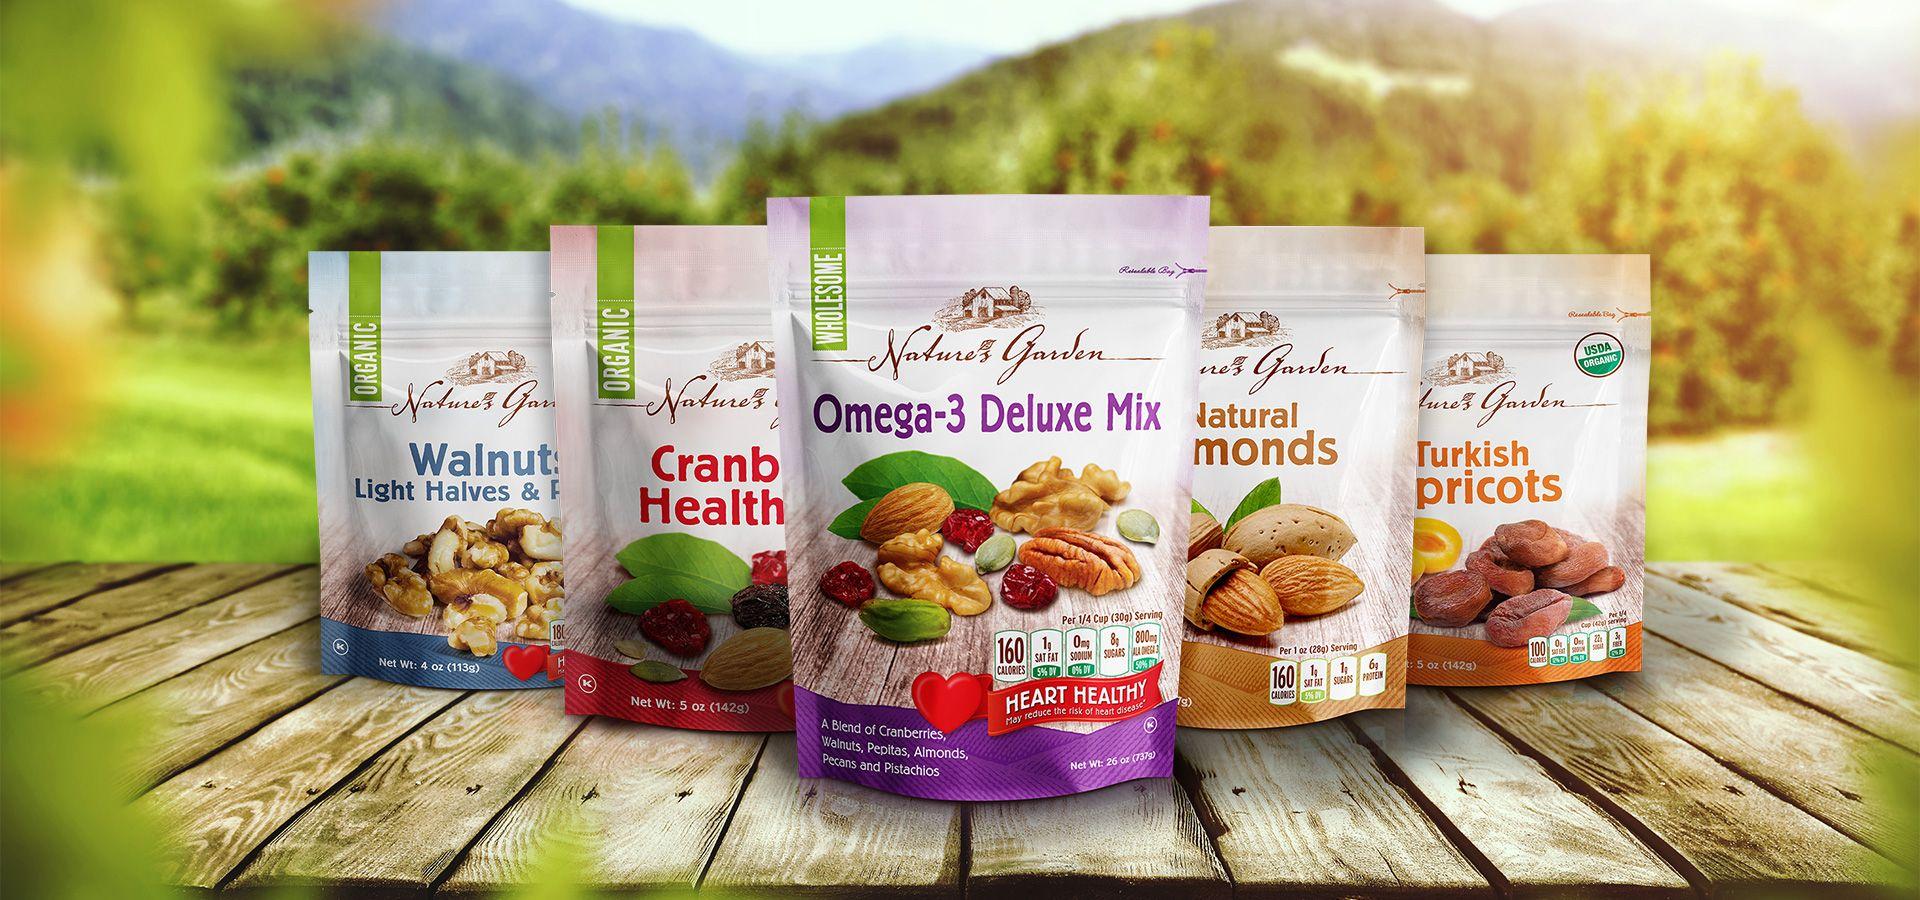 Naturesgarden Organic Nuts Trail Mix Snack Fruit